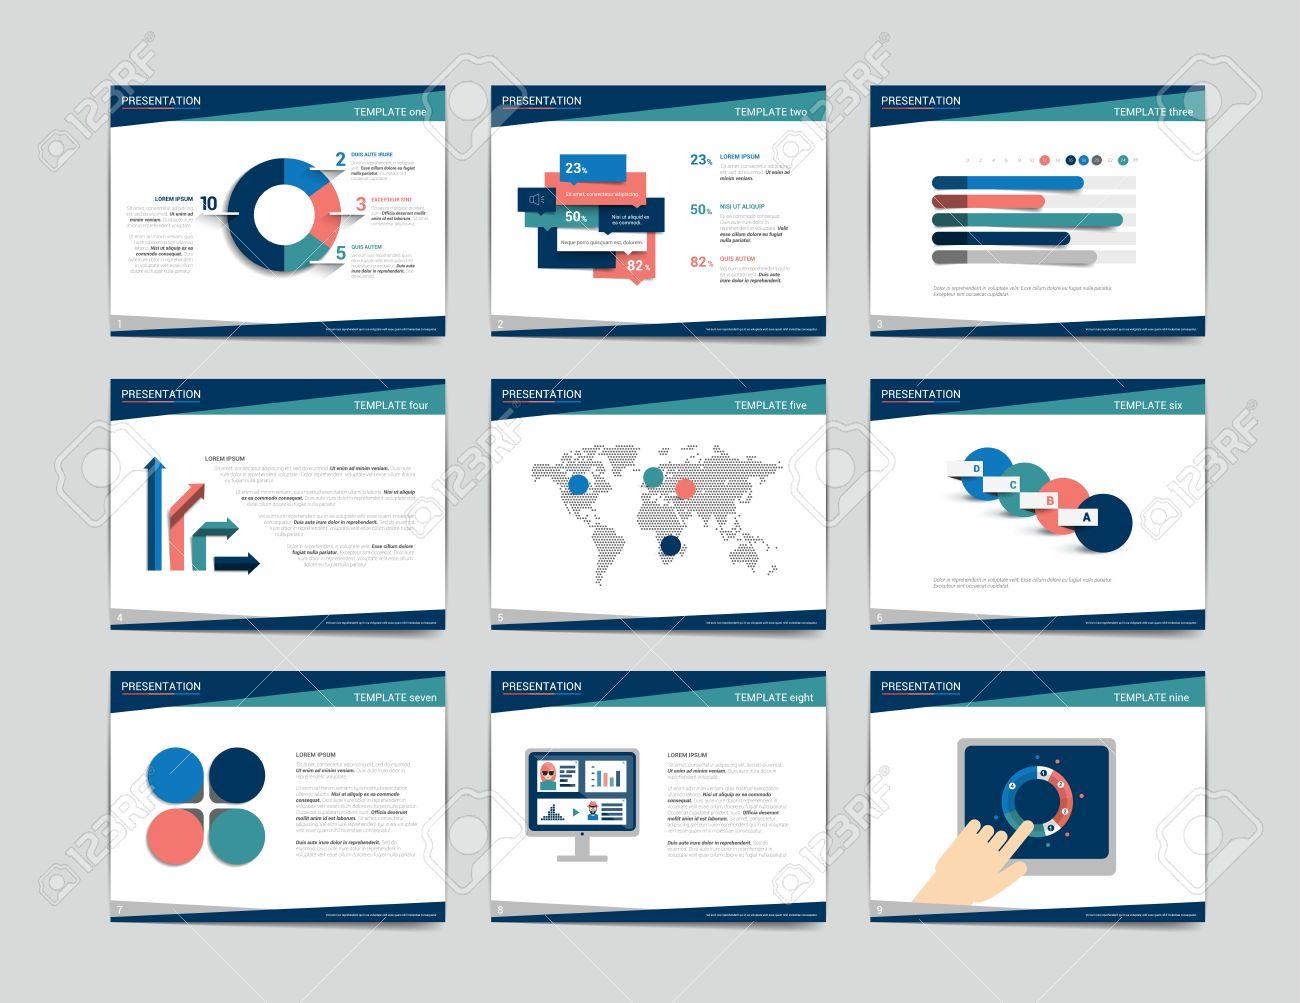 9 business presentation templates infographics for leaflet 9 business presentation templates infographics for leaflet poster slide magazine book flashek Gallery